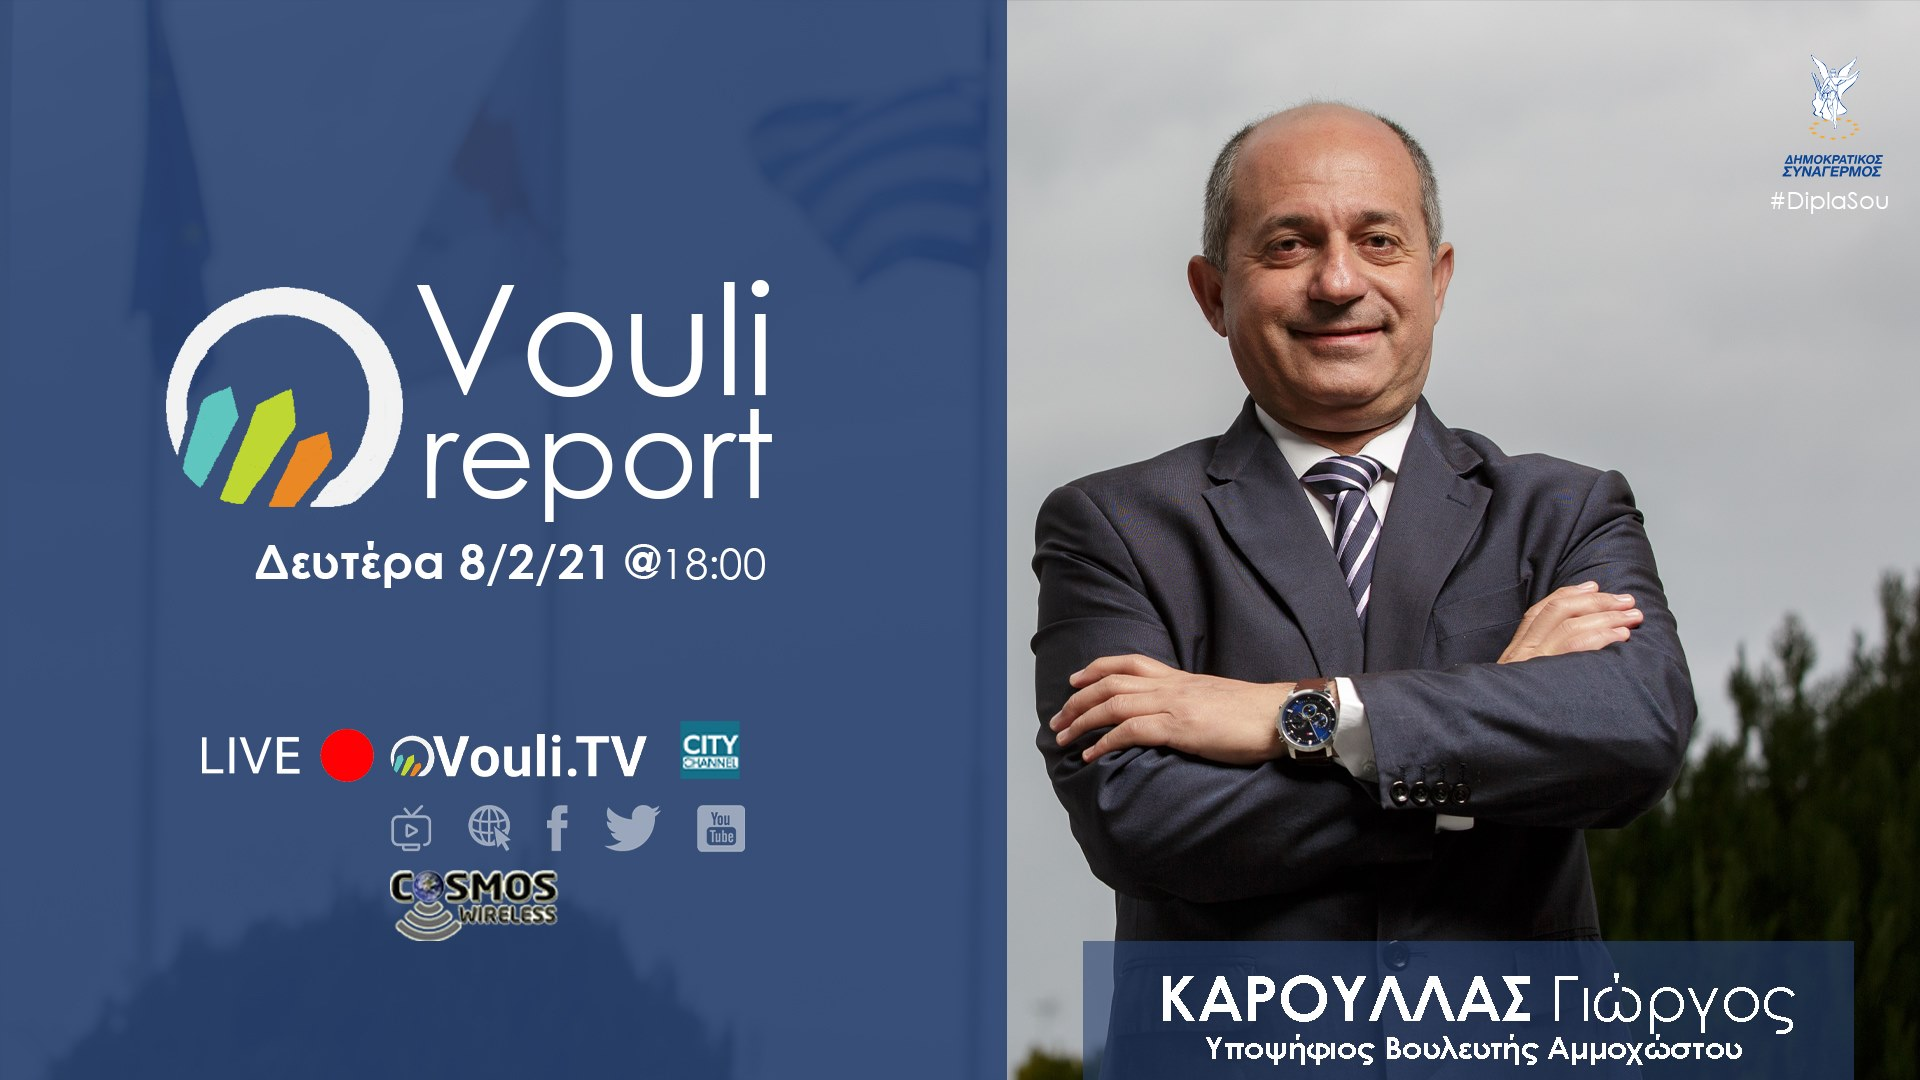 Vouli Report - Γιώργος Κάρουλλας 8/02/2021